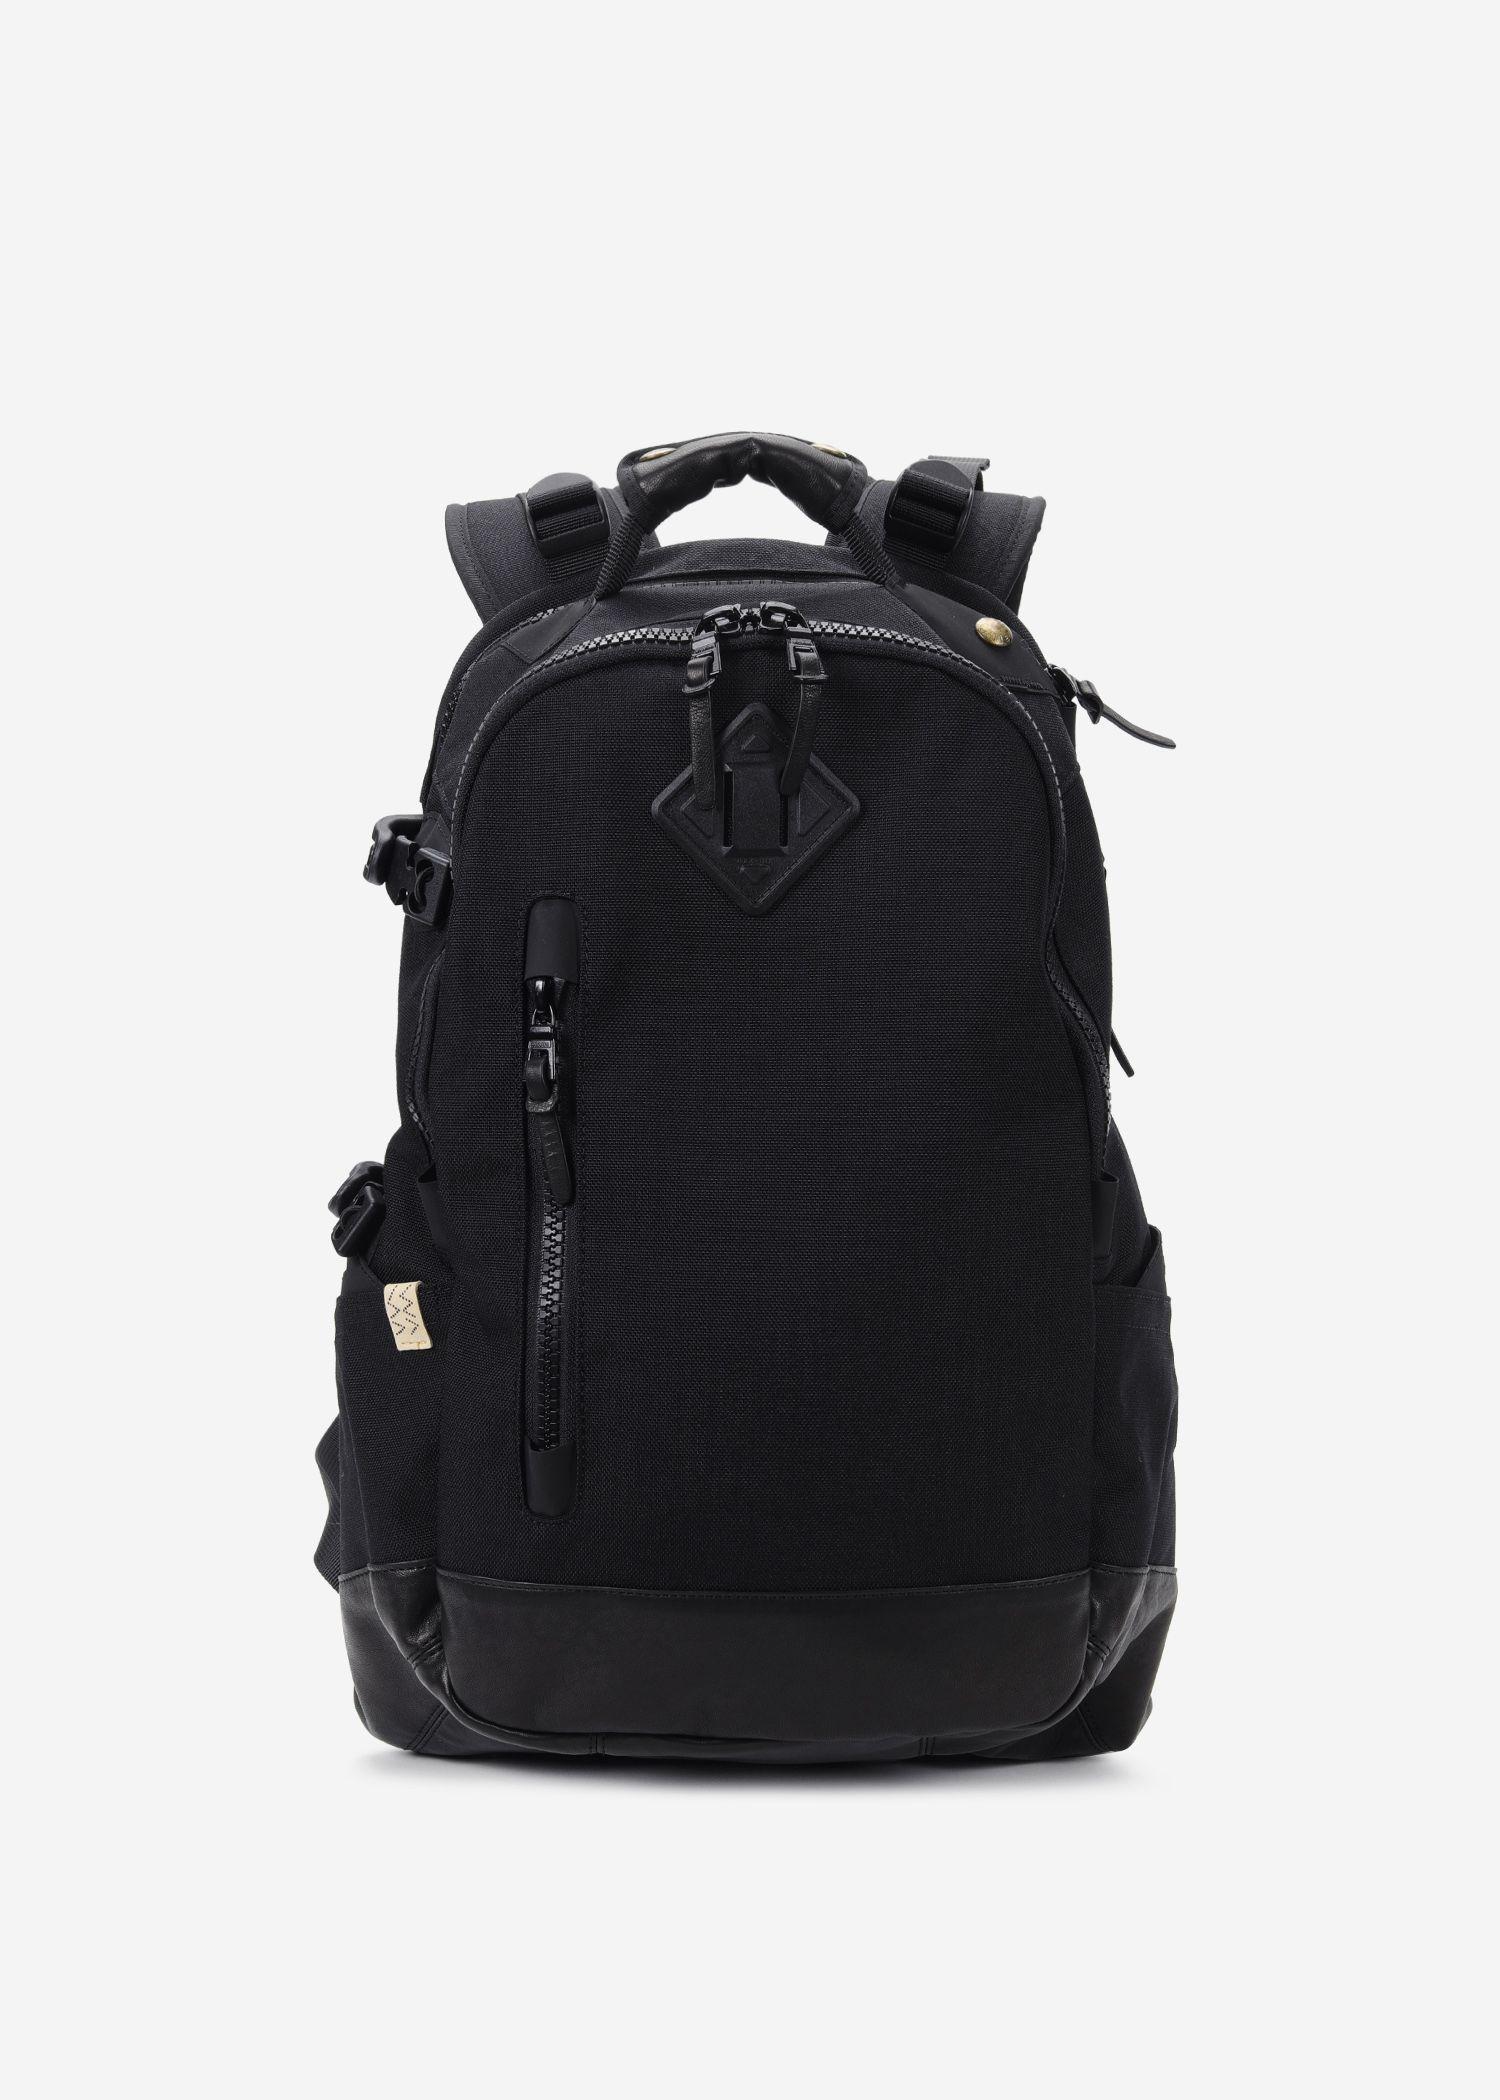 070d2db56 VISVIM CORDURA 20L (FRA VEG LAMB). #visvim #bags #leather #lining ...